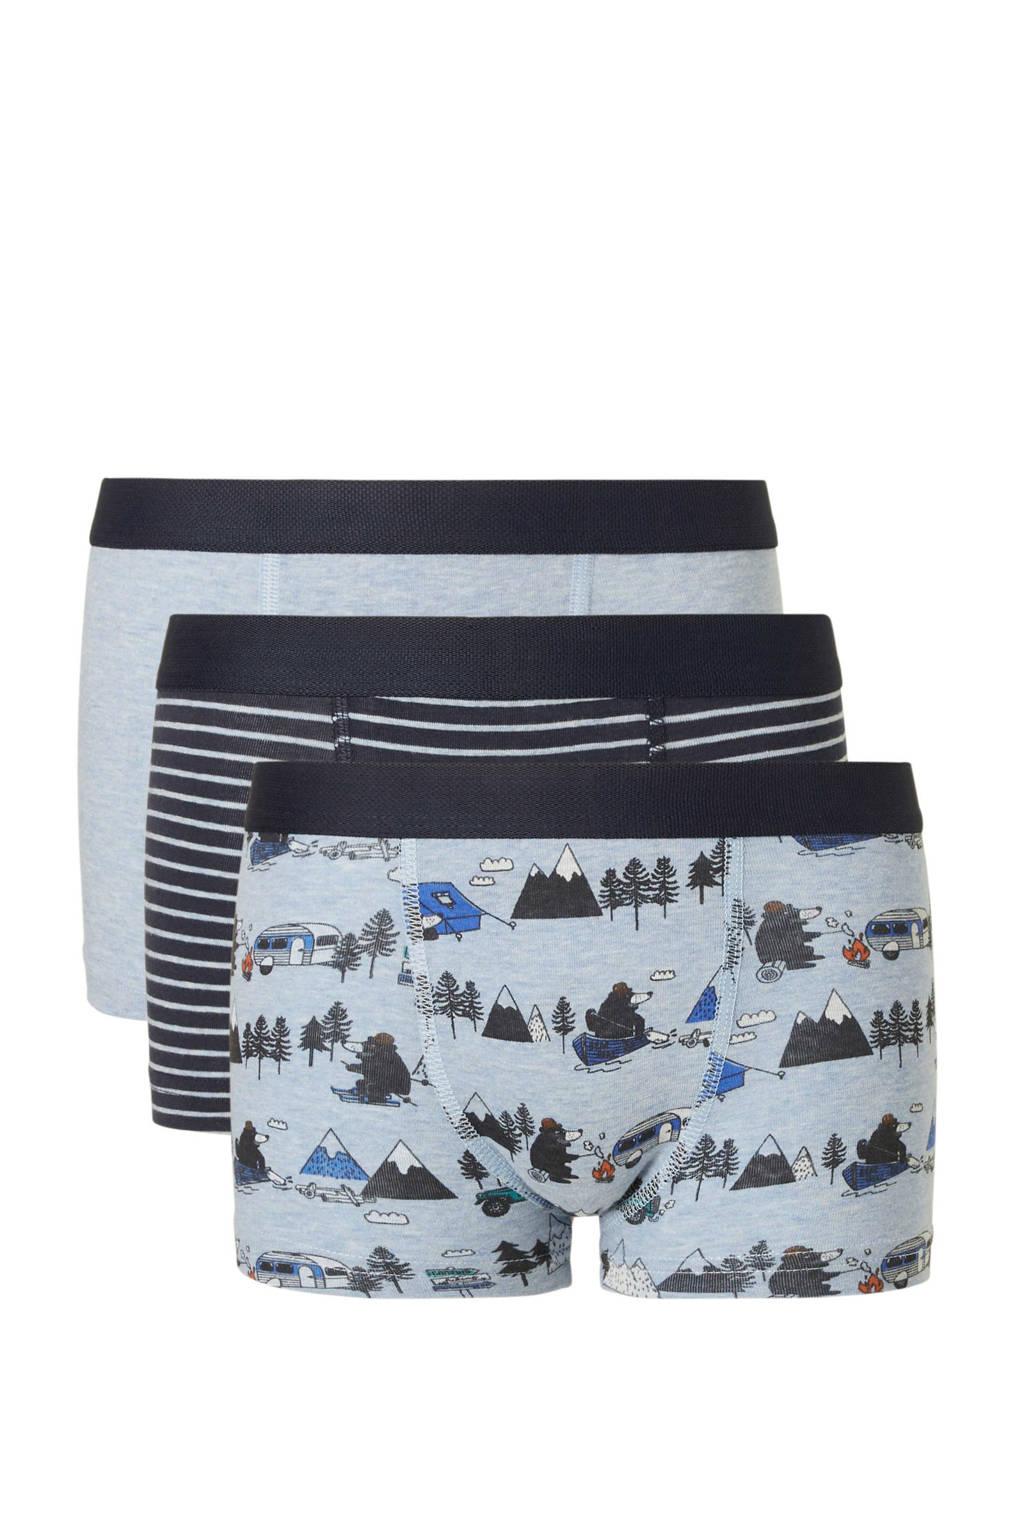 C&A Palomino   boxershort blauw - set van 3, Lichtblauw